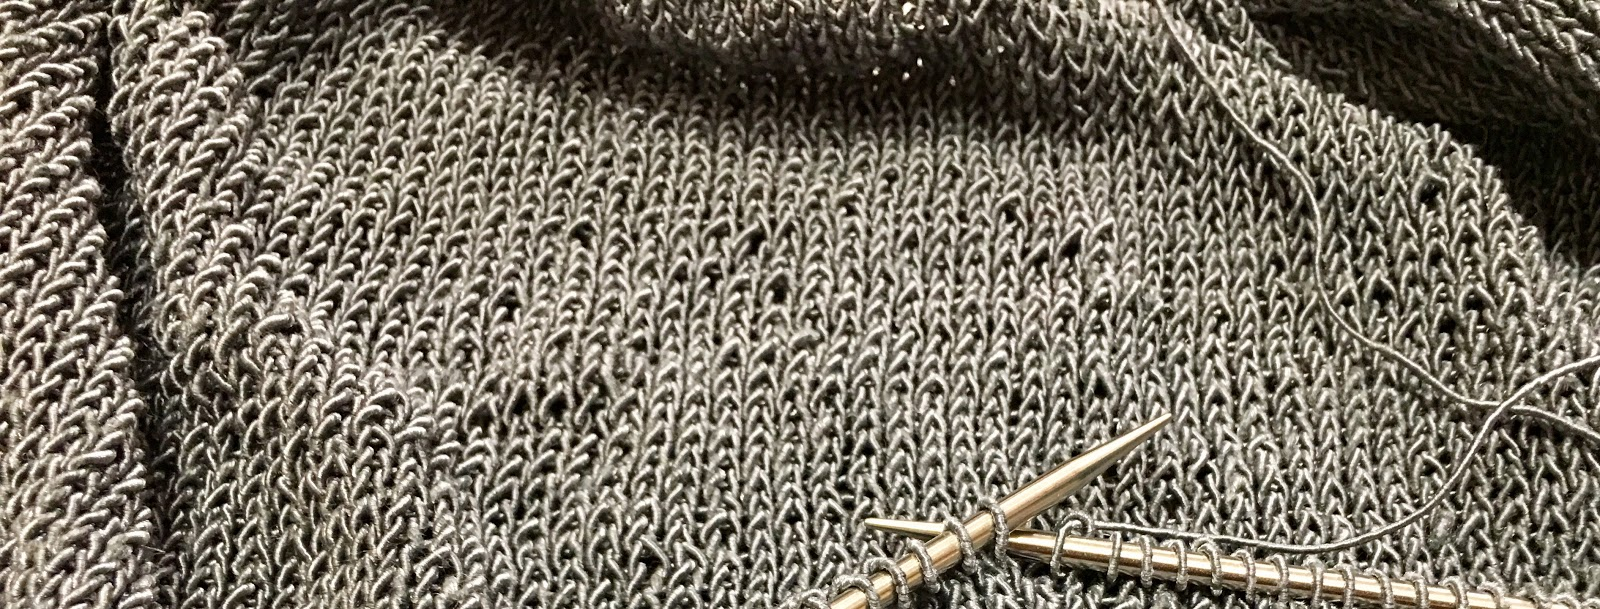 Stitch and Chat: Portuguese Knitting